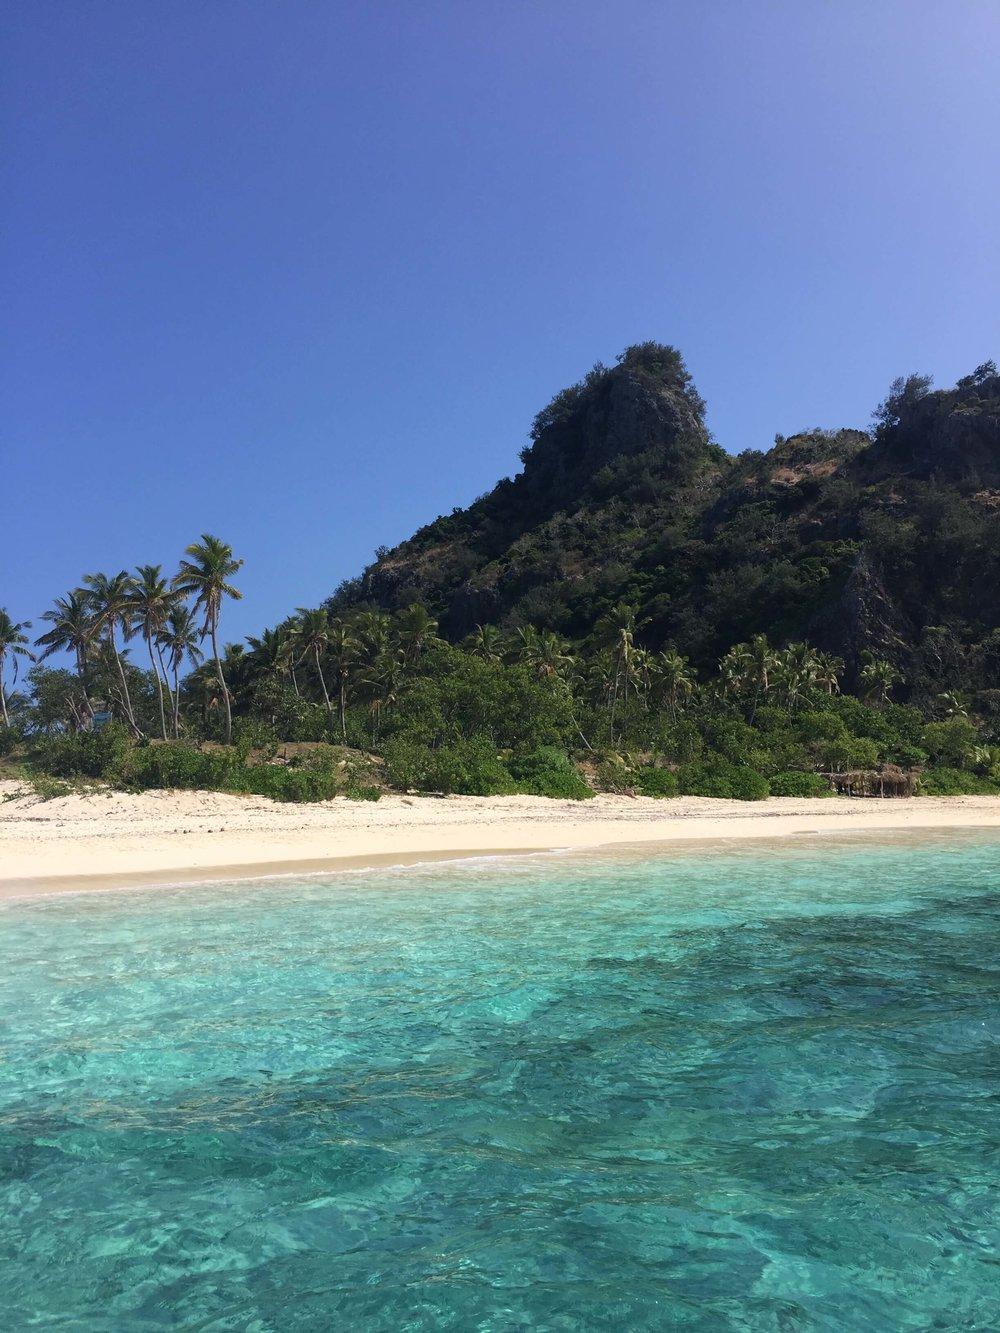 A day trip to the uninhabited Mondriki Island, where the Tom Hanks' movie, Castaway, was filmed.